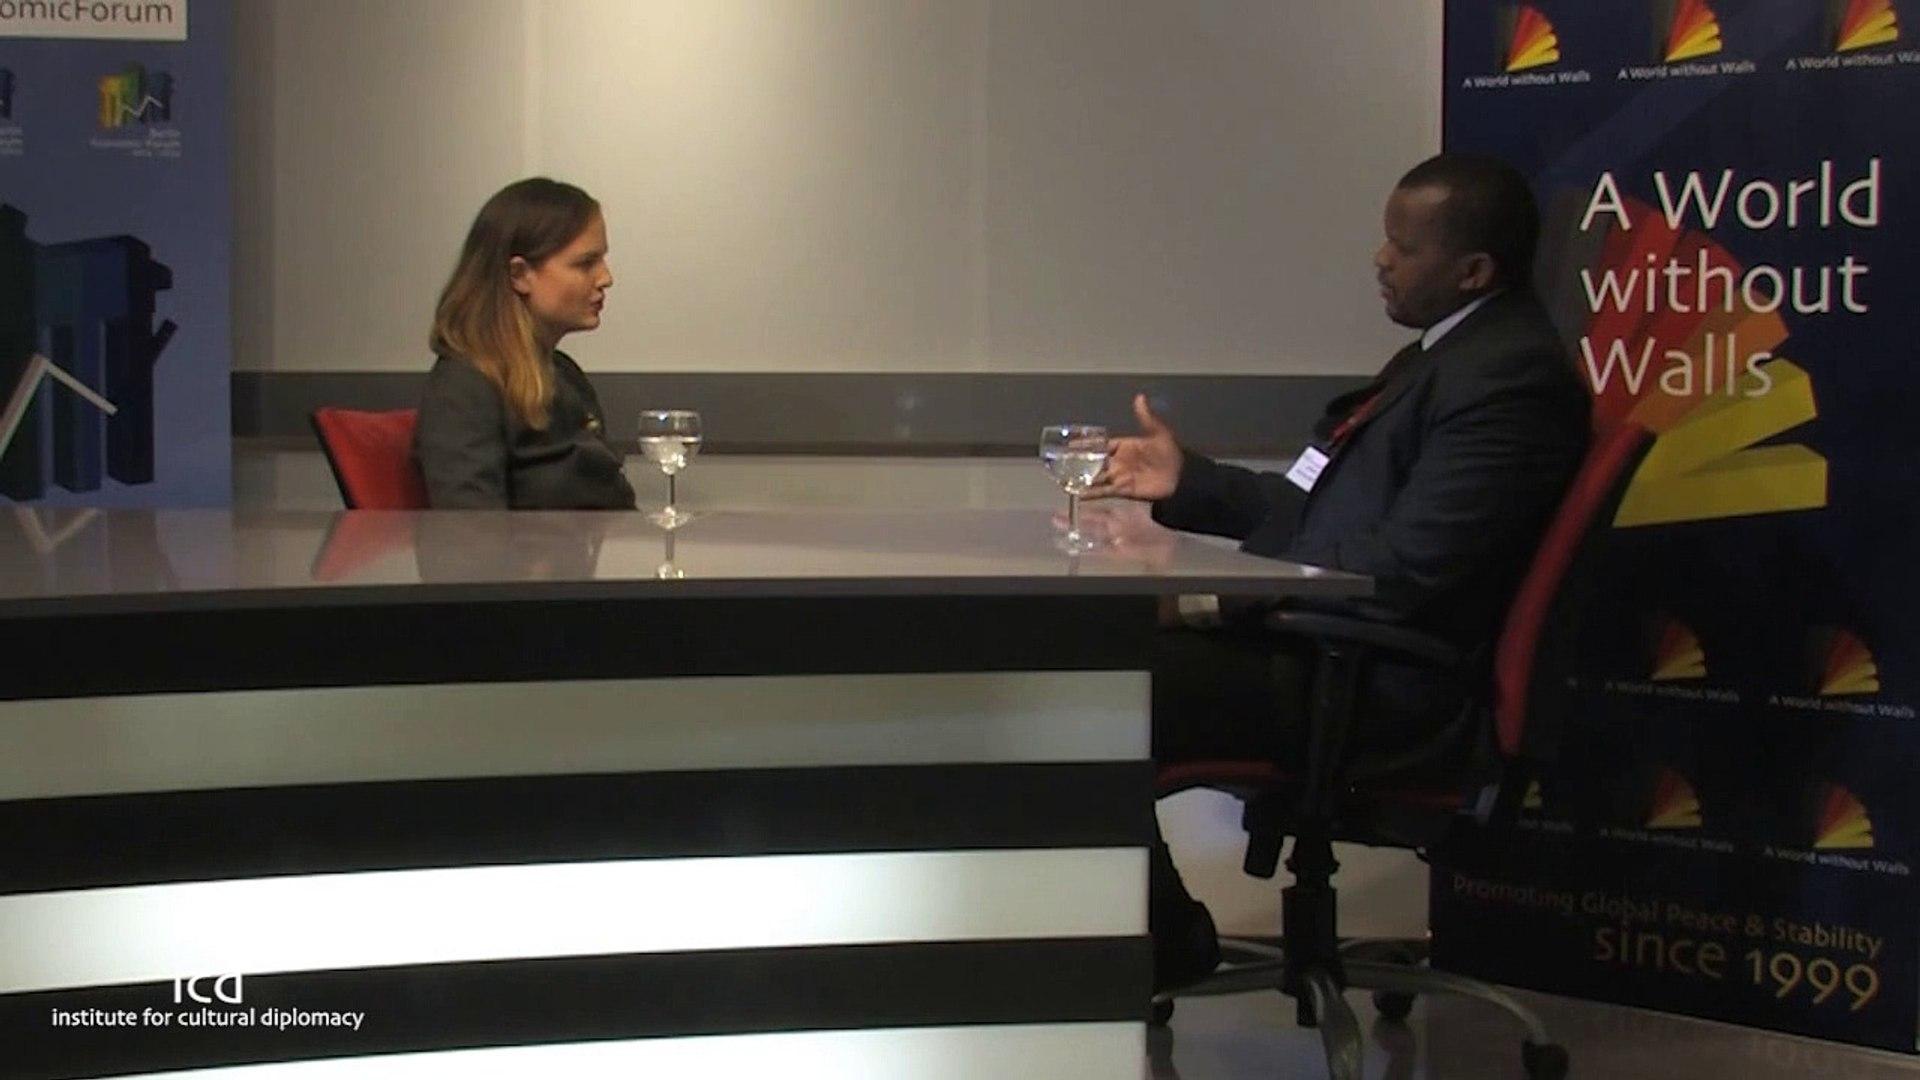 Prince Africa Zulu of Onkweni (Zulu Prince; Chairman of the Prince Africa Zulu Foundation Trust)